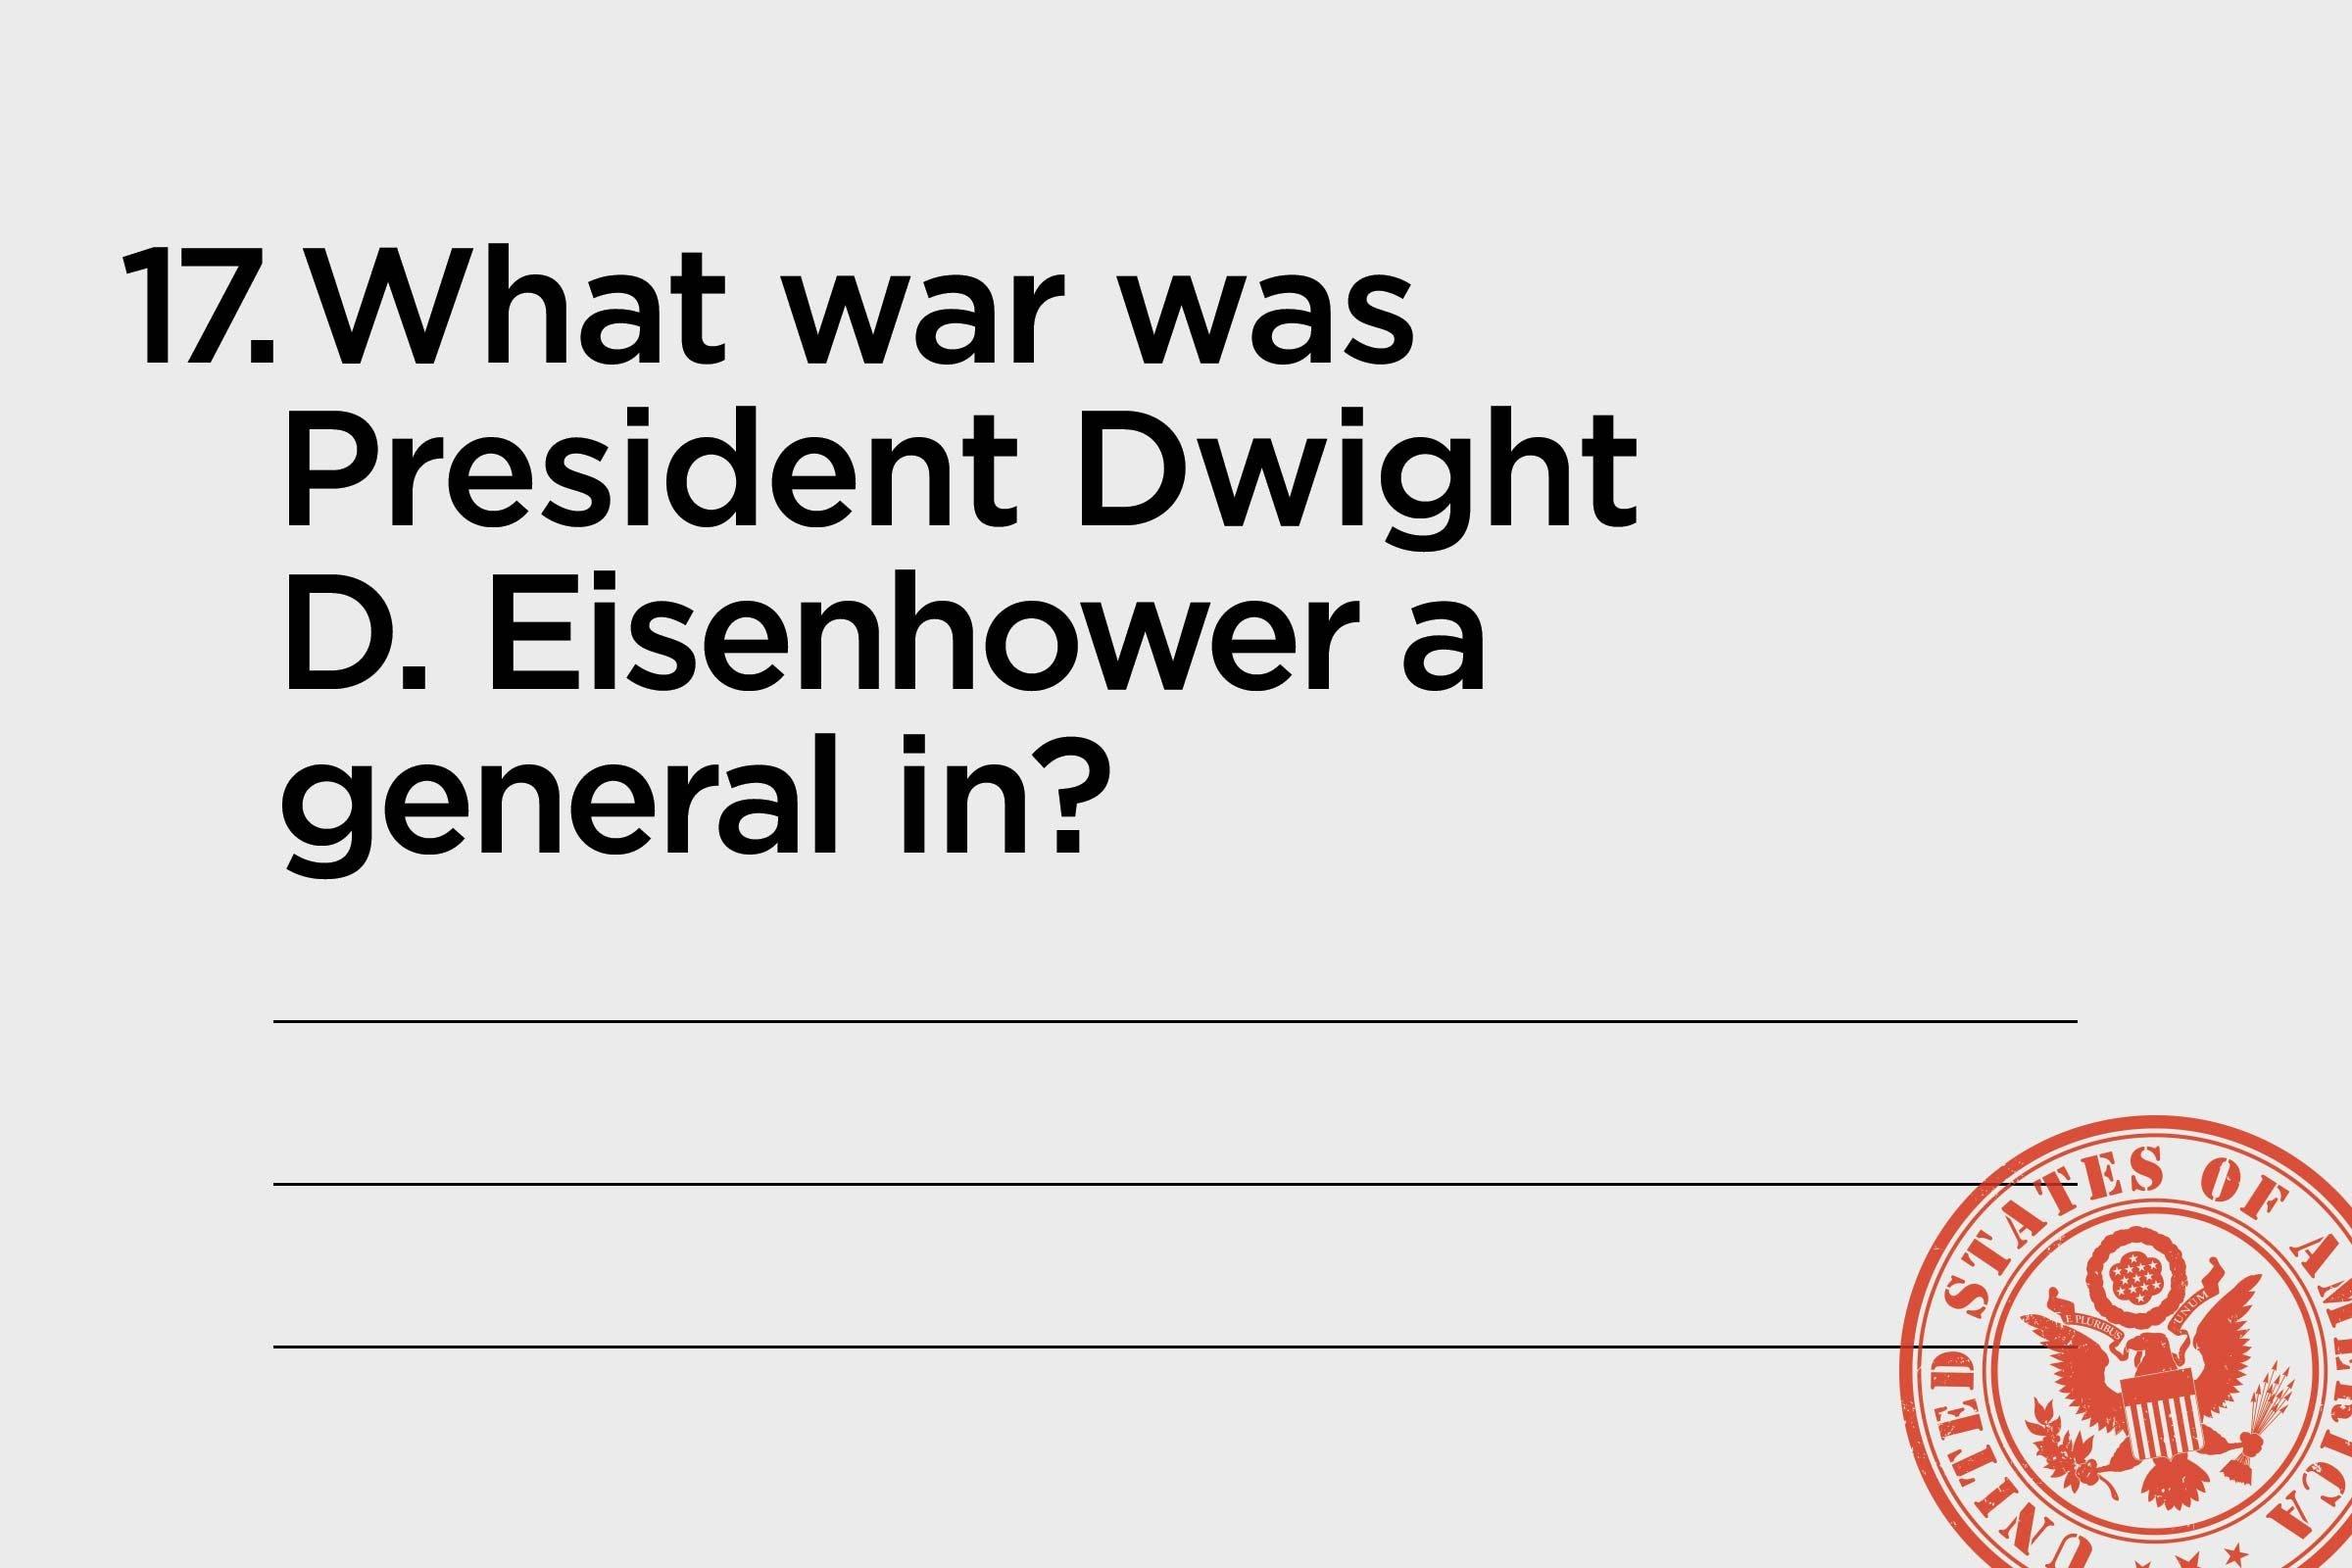 eisenhower was a general in...